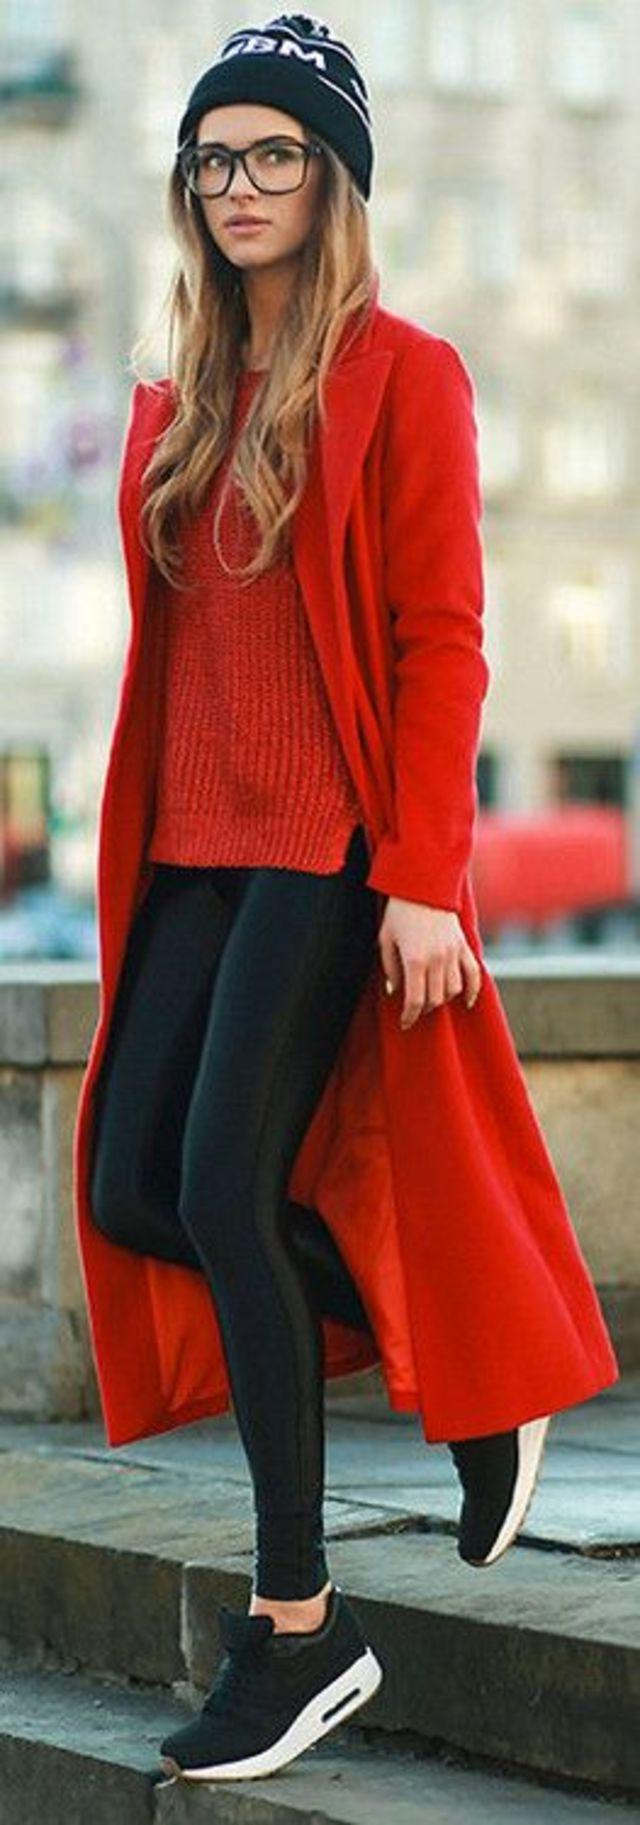 black sneakers + leather skinnies + red sweater + red coat + black beanie